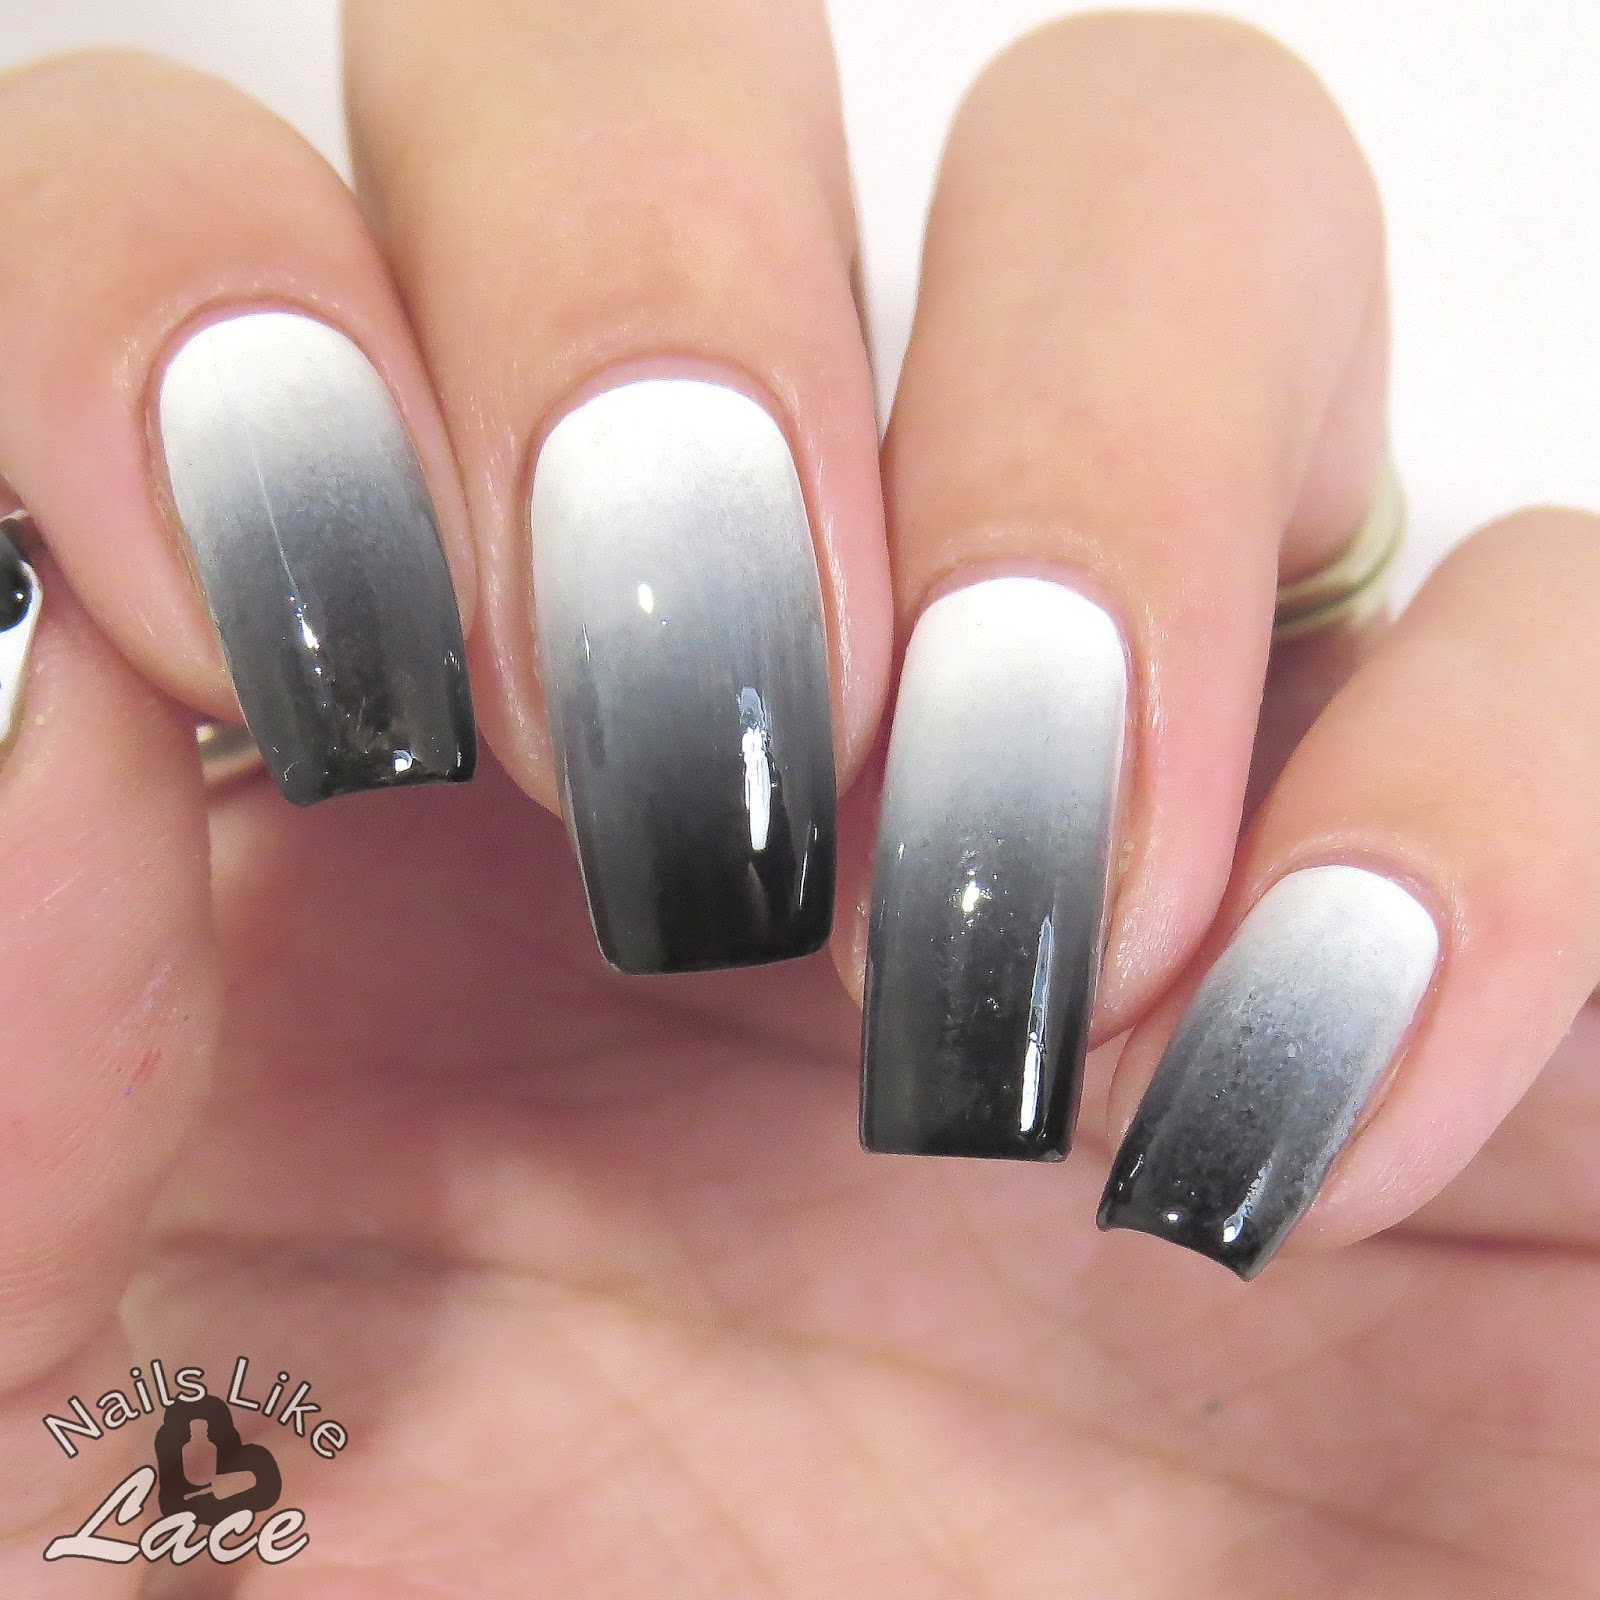 Christmas Nails On Black Hands: NailsLikeLace: 40 Great Nail Art Ideas